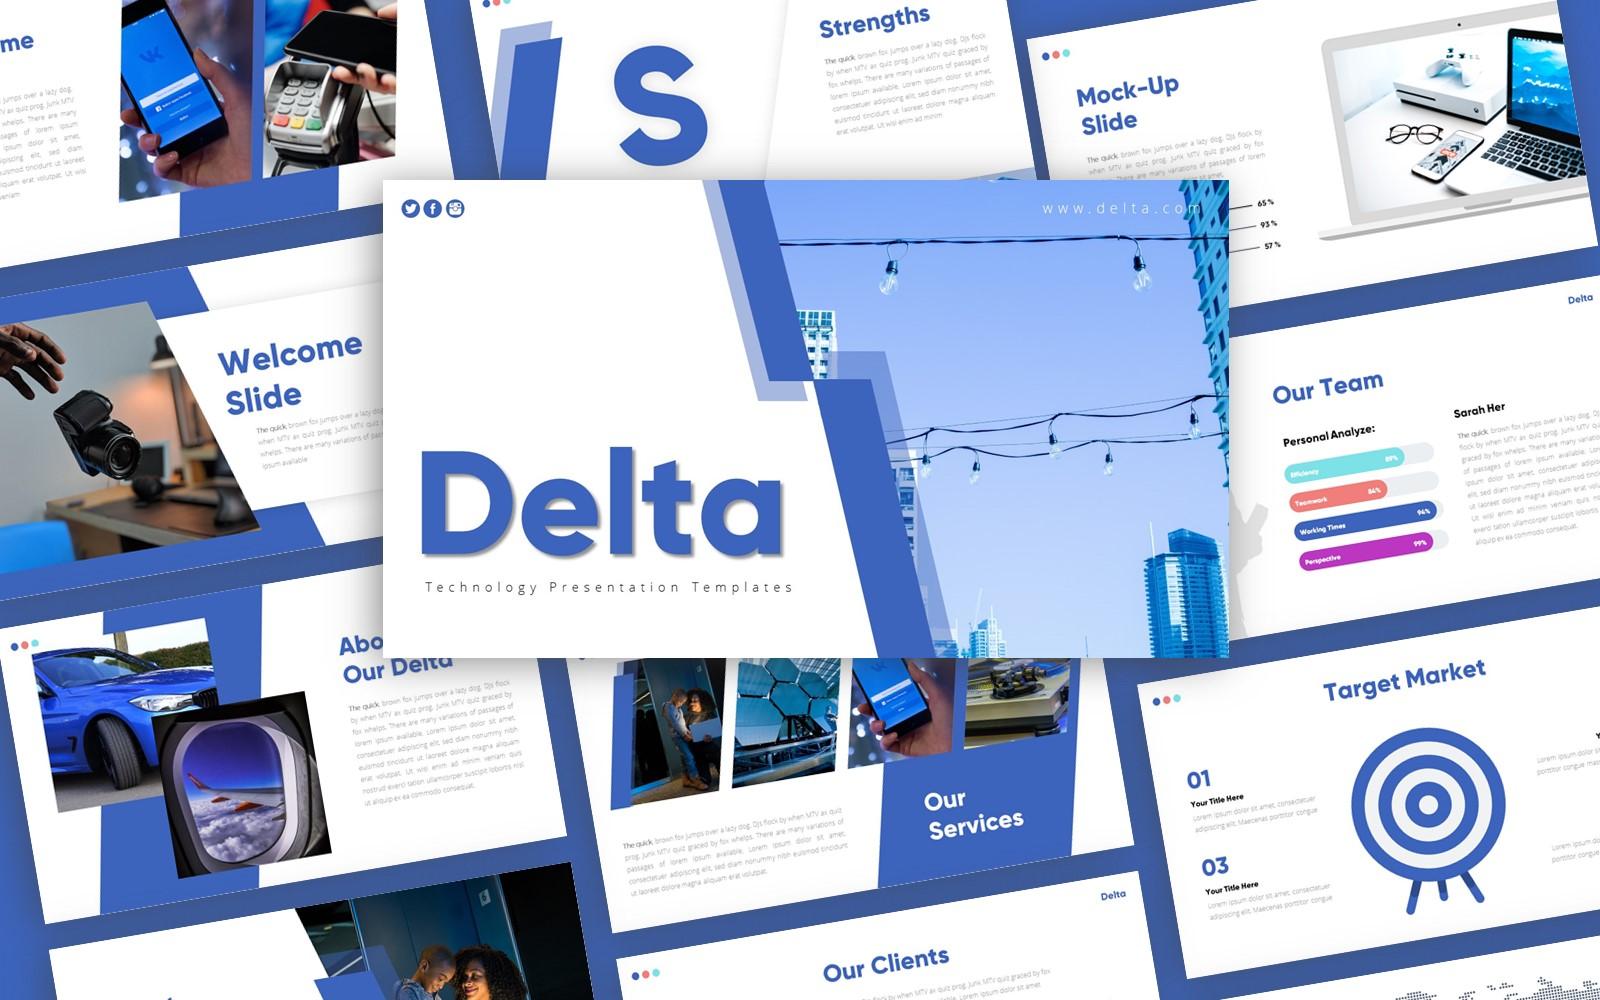 Delta Technology Presentation PowerPoint Template